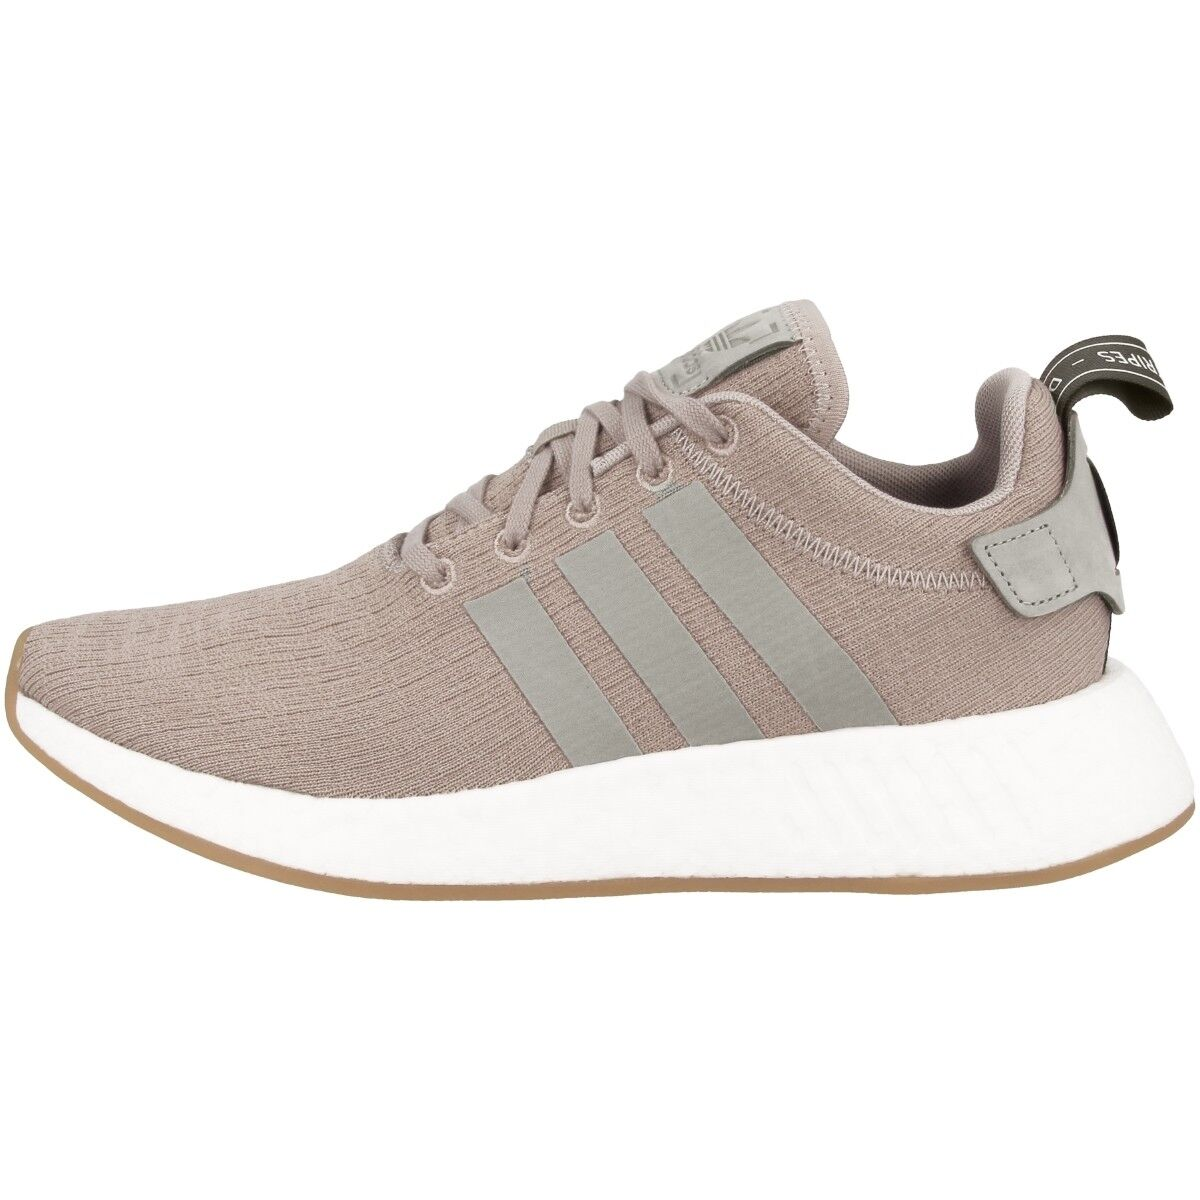 Adidas NMD_R2 Chaussures Baskets Chaussures NMD_R2 de Loisirs / Vapeur Gris cq2399 077cf9